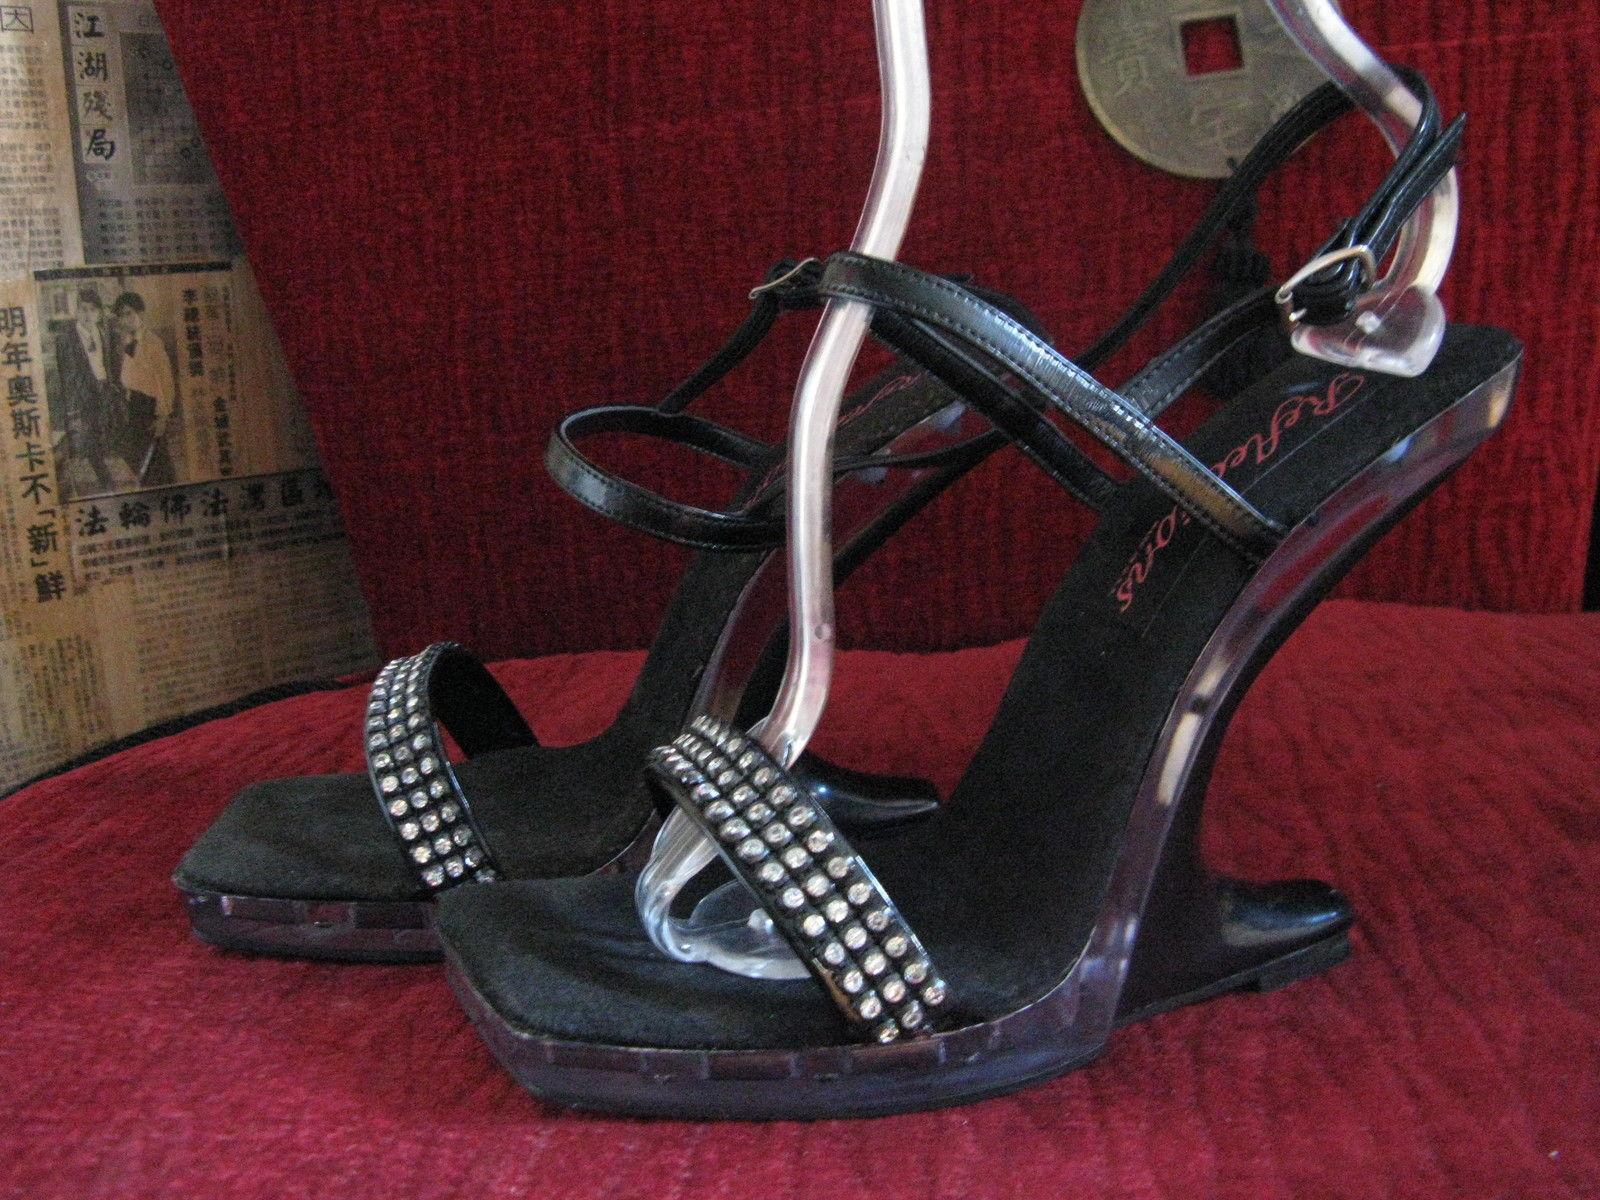 Reflections lucite rhinestone pin-up platform sandals shoes 38 8 UK5.5 VLV